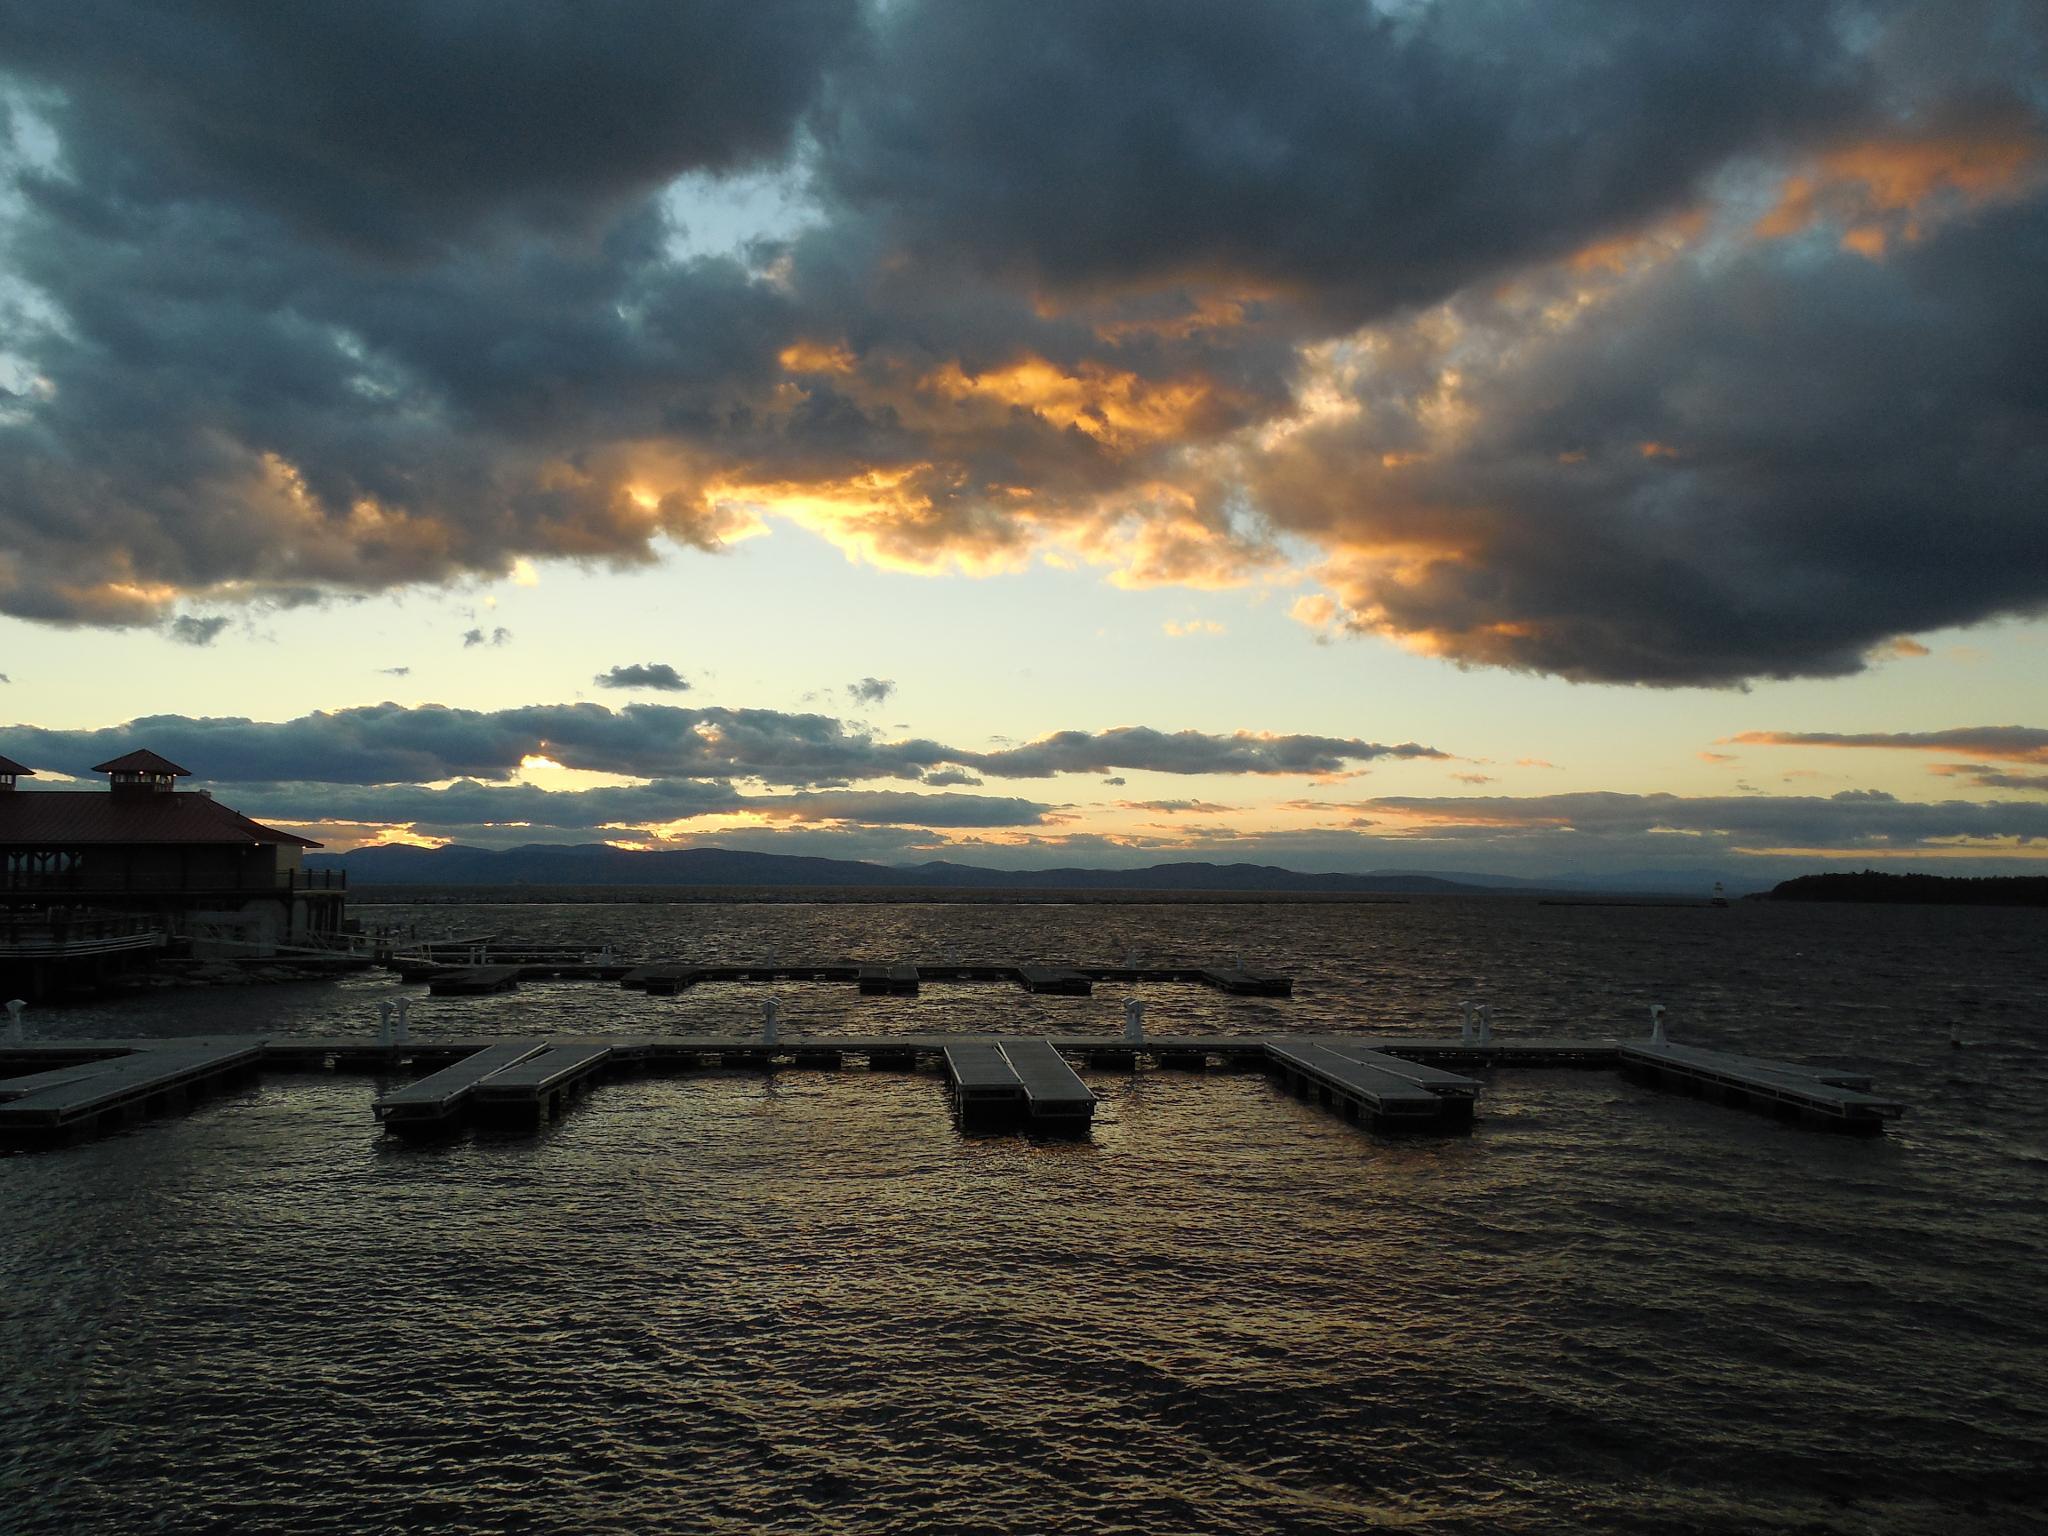 Sunset lake by Steve